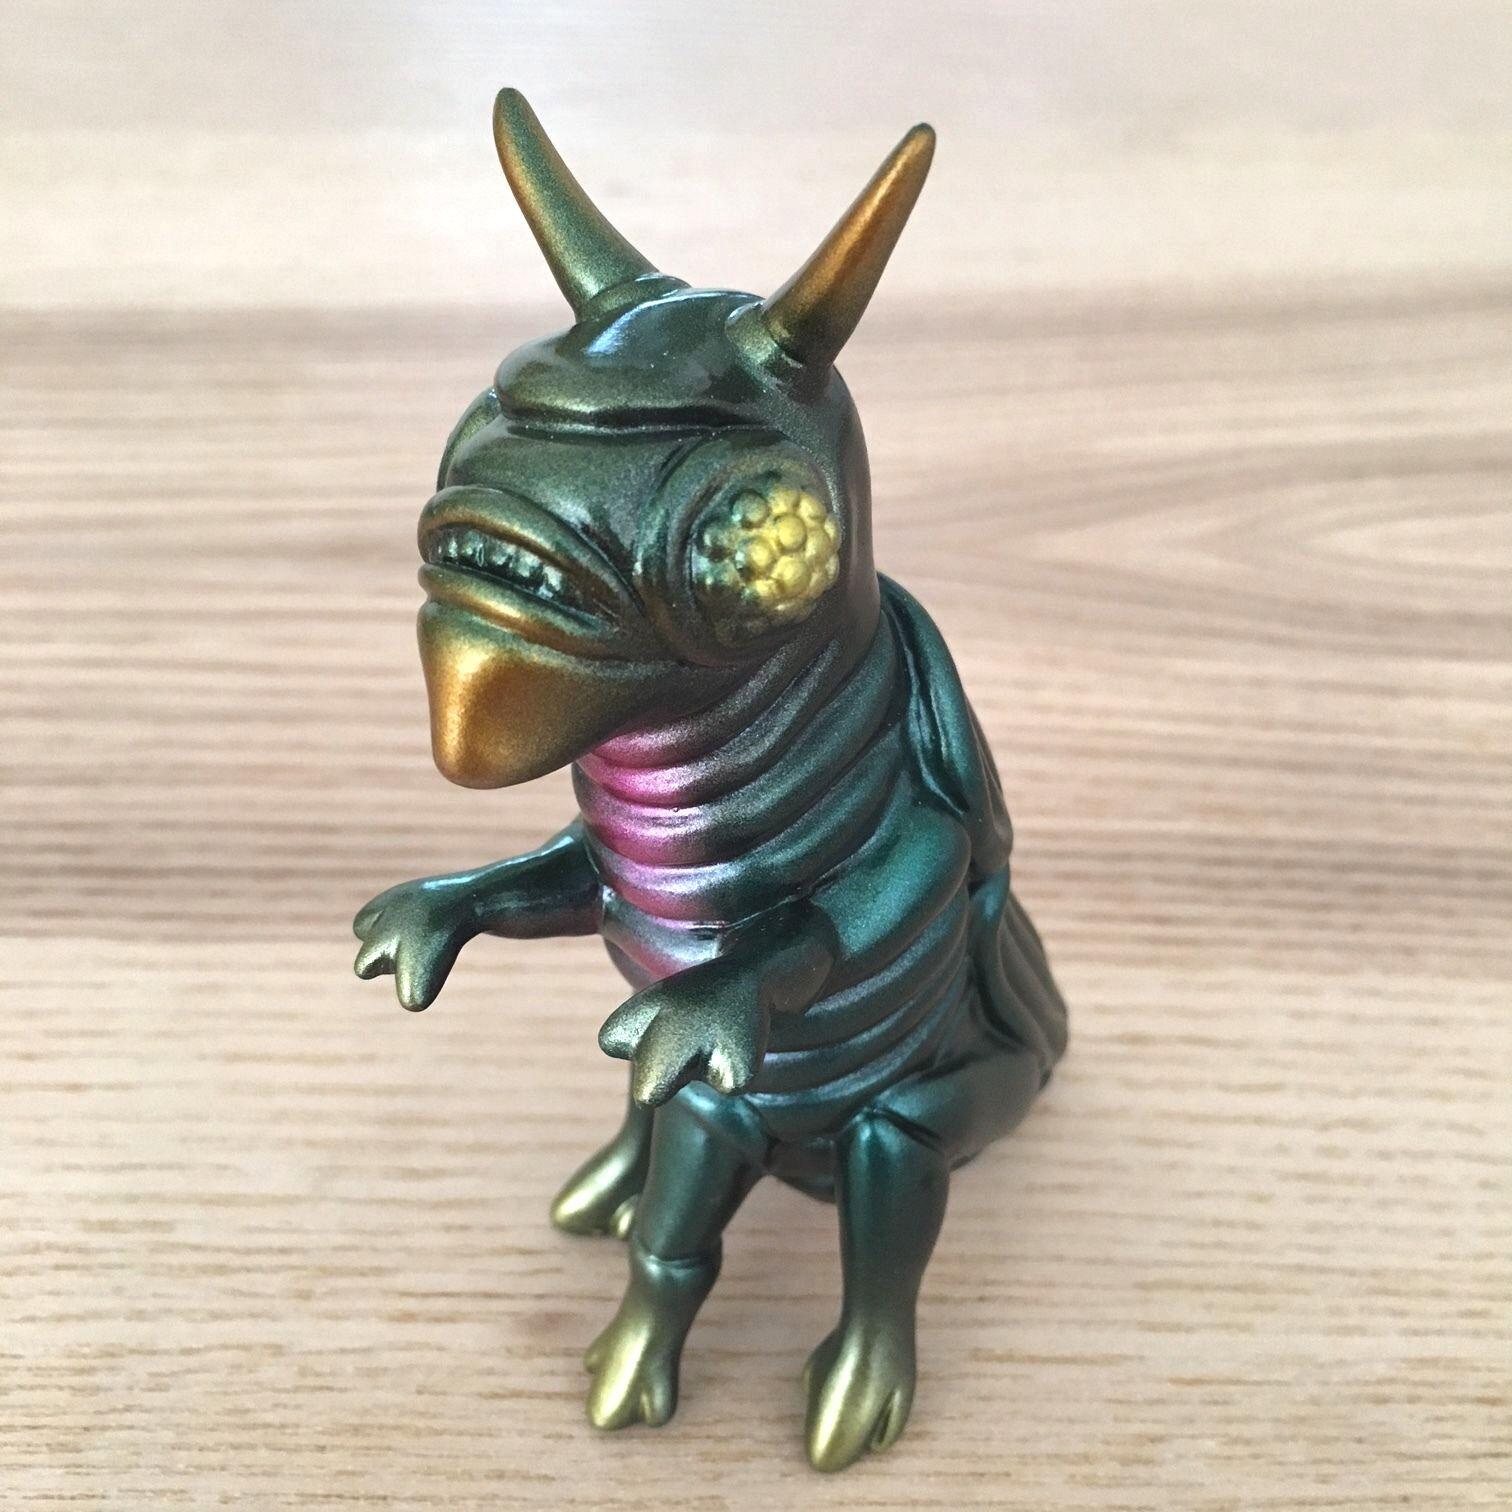 Paul Kaiju quateroid japonés Vinilo Figura de juguete a estrenar en bolsa